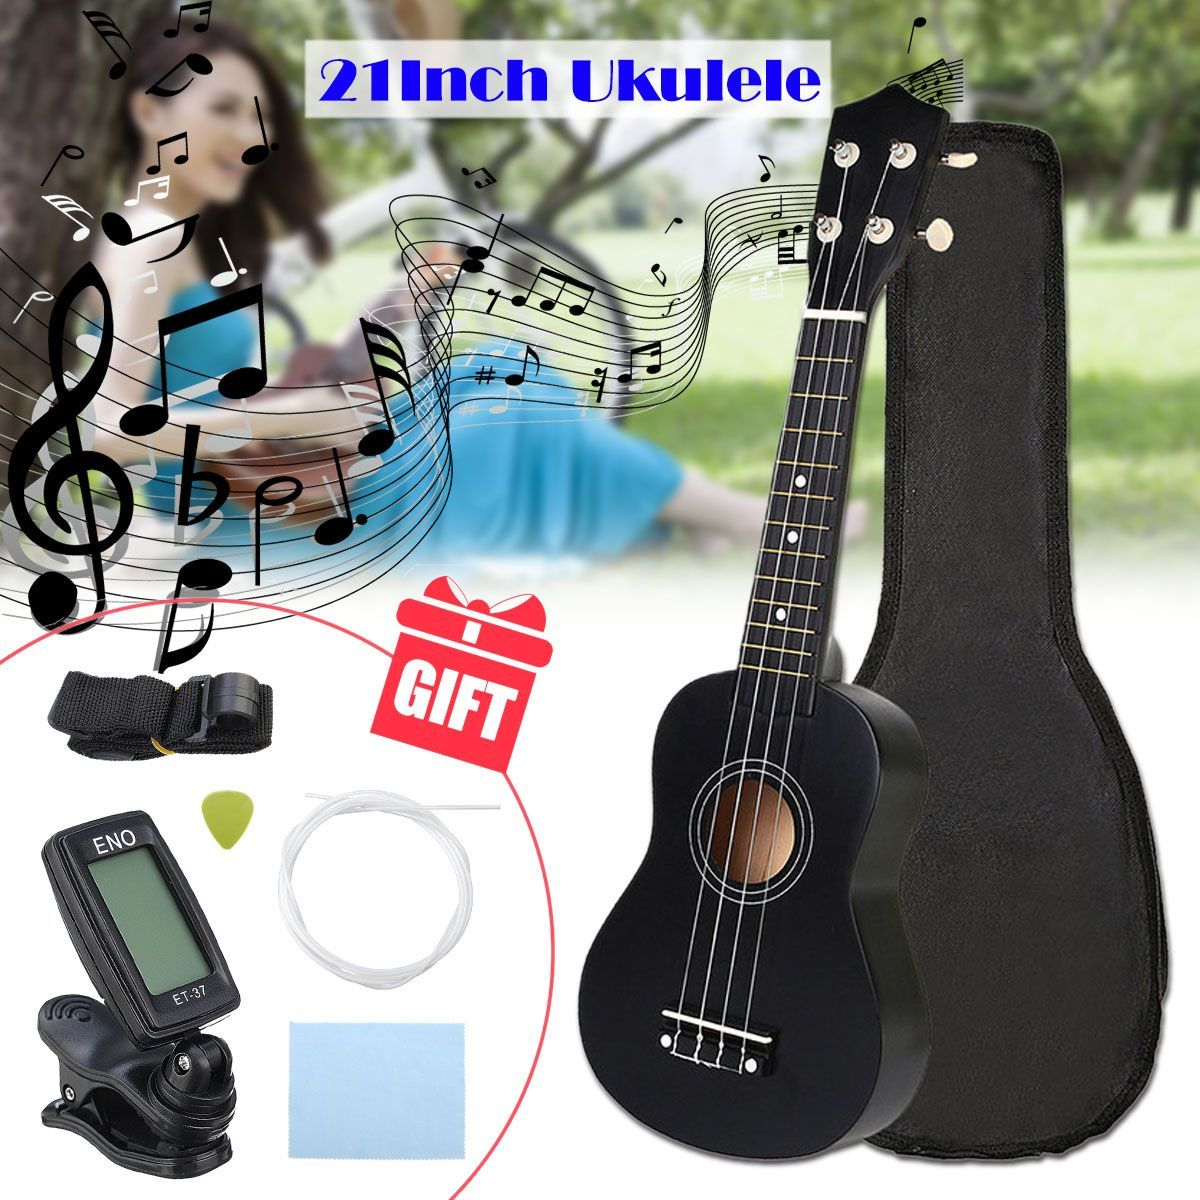 Zebra 21 inch Ukelele Soprano 4 Strings Hawaiian Spruce Basswood Guitar Musical Instrument Set Kits+Tuner+String+Strap+Bag